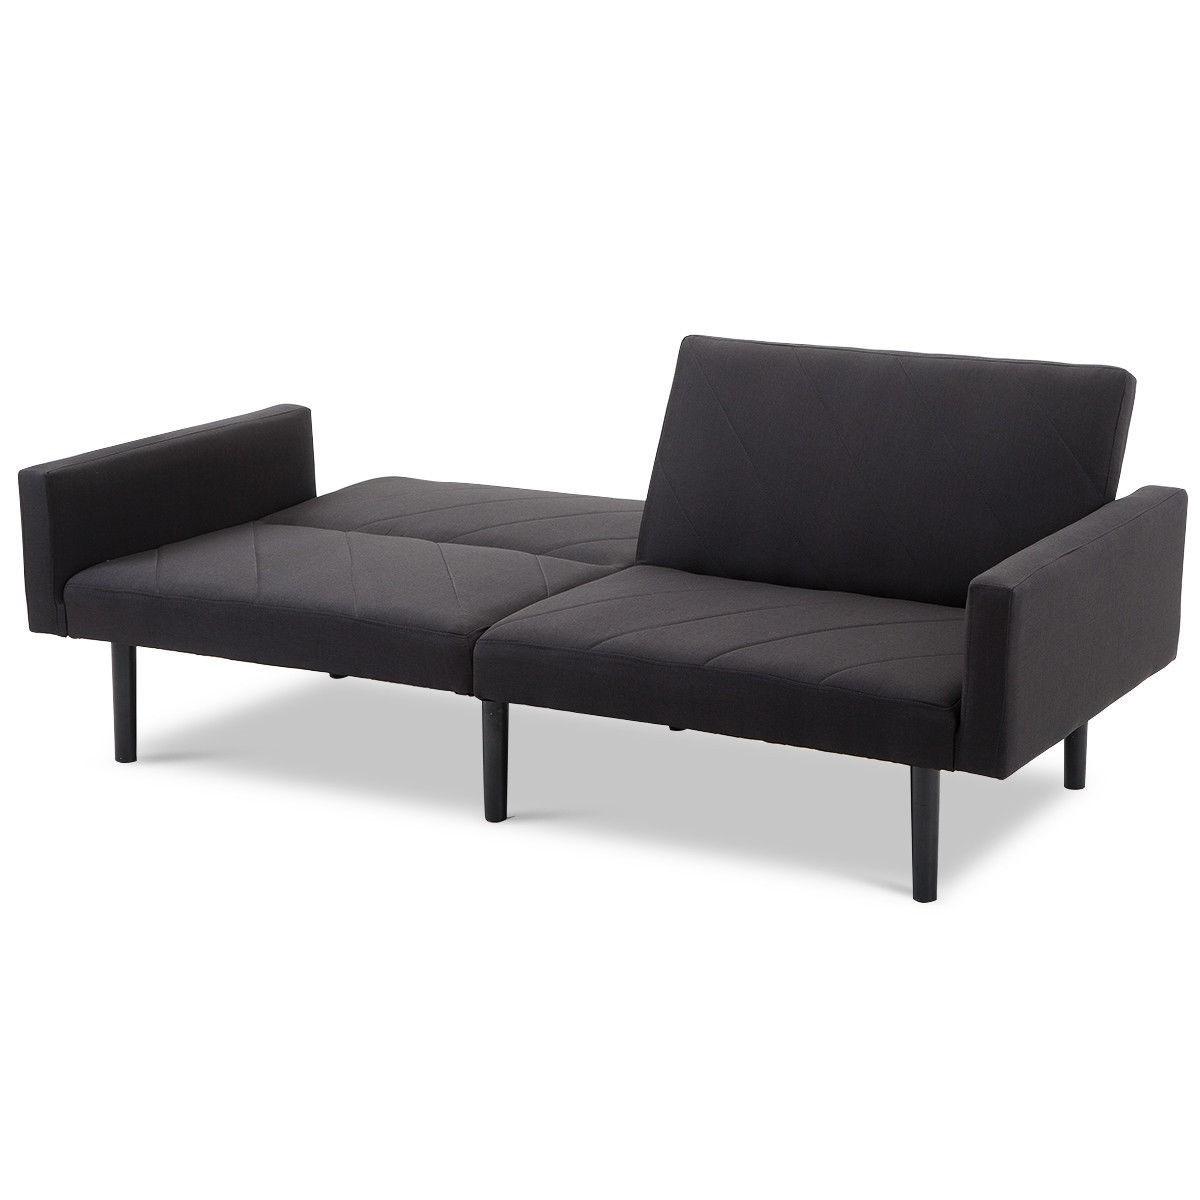 Magnificent Modern Black Linen Split Back Futon Sleeper Sofa Bed Couch Beatyapartments Chair Design Images Beatyapartmentscom